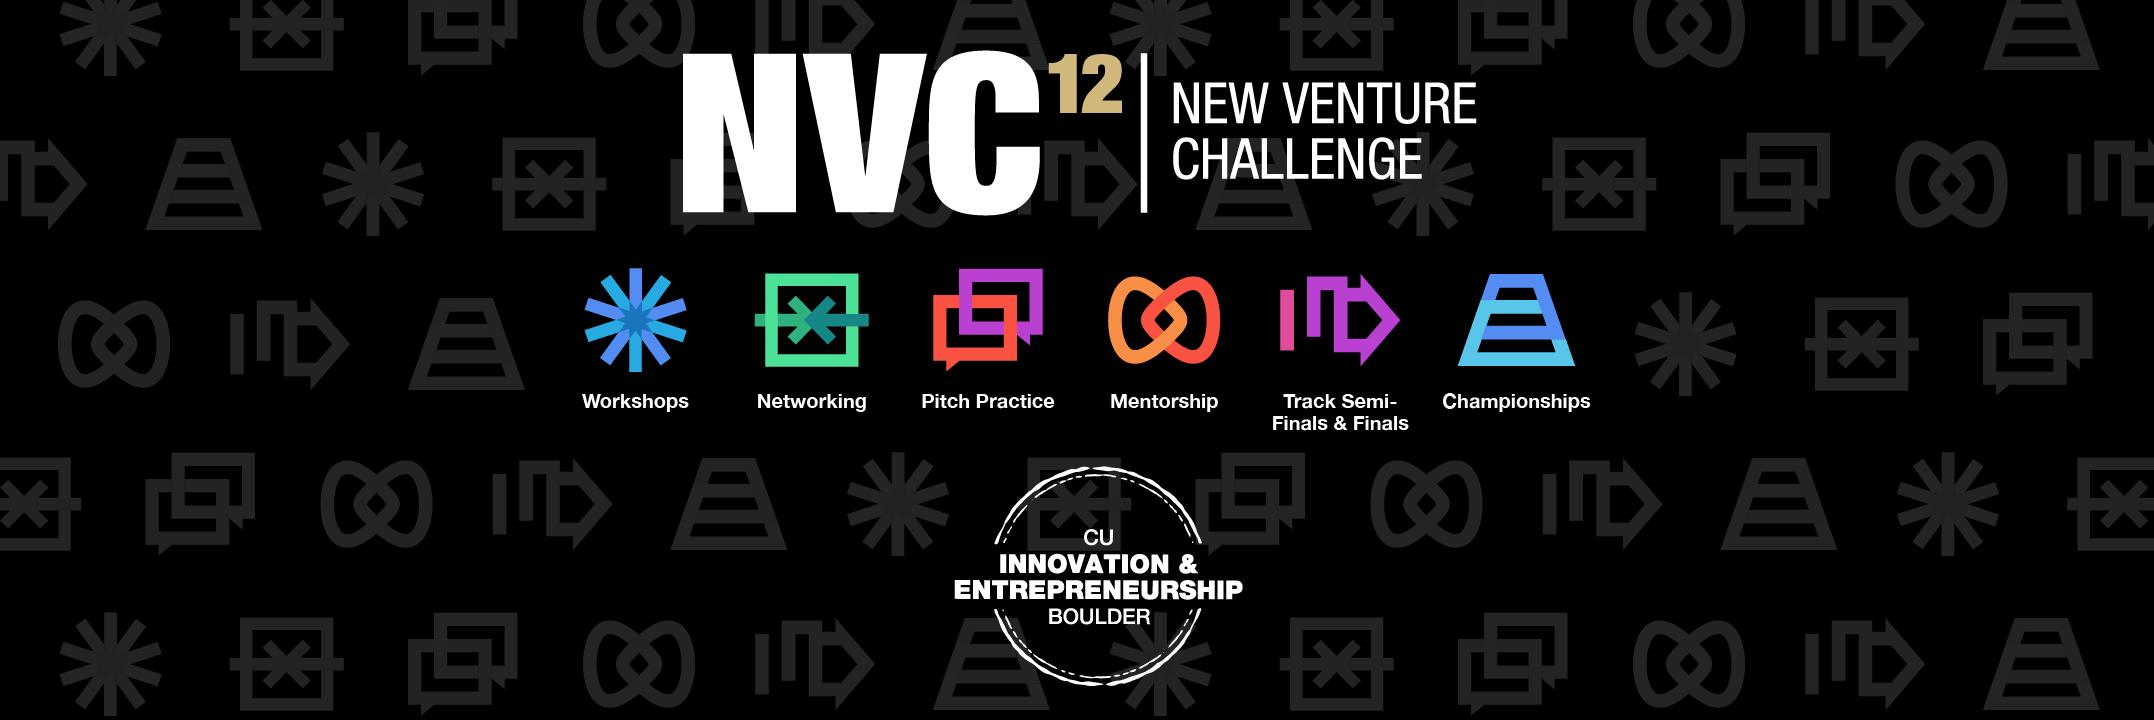 new venture 12 header